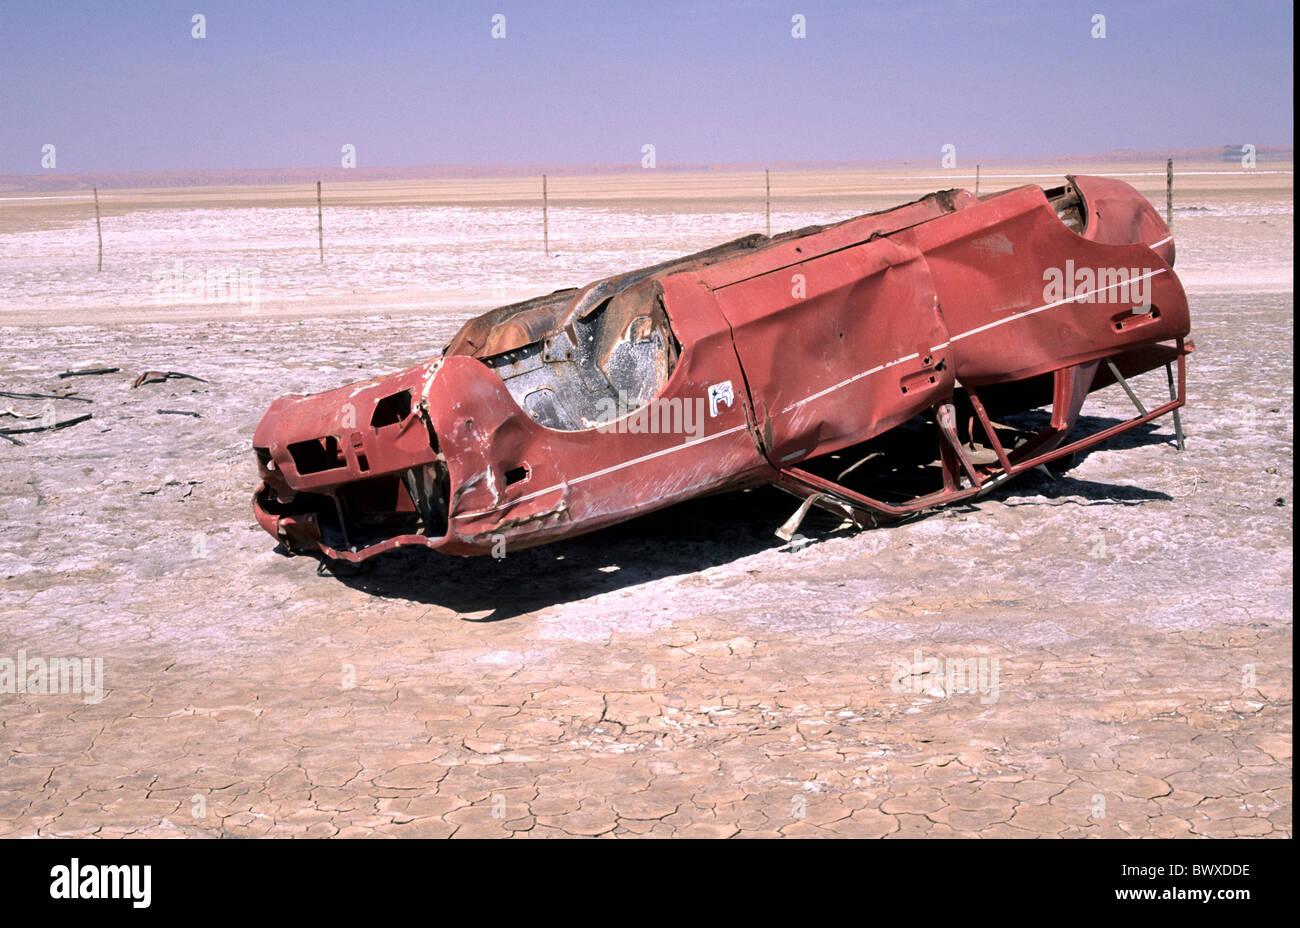 grit slope scrap vehicle near Riedfonten scenery red South Africa desert - Stock Image